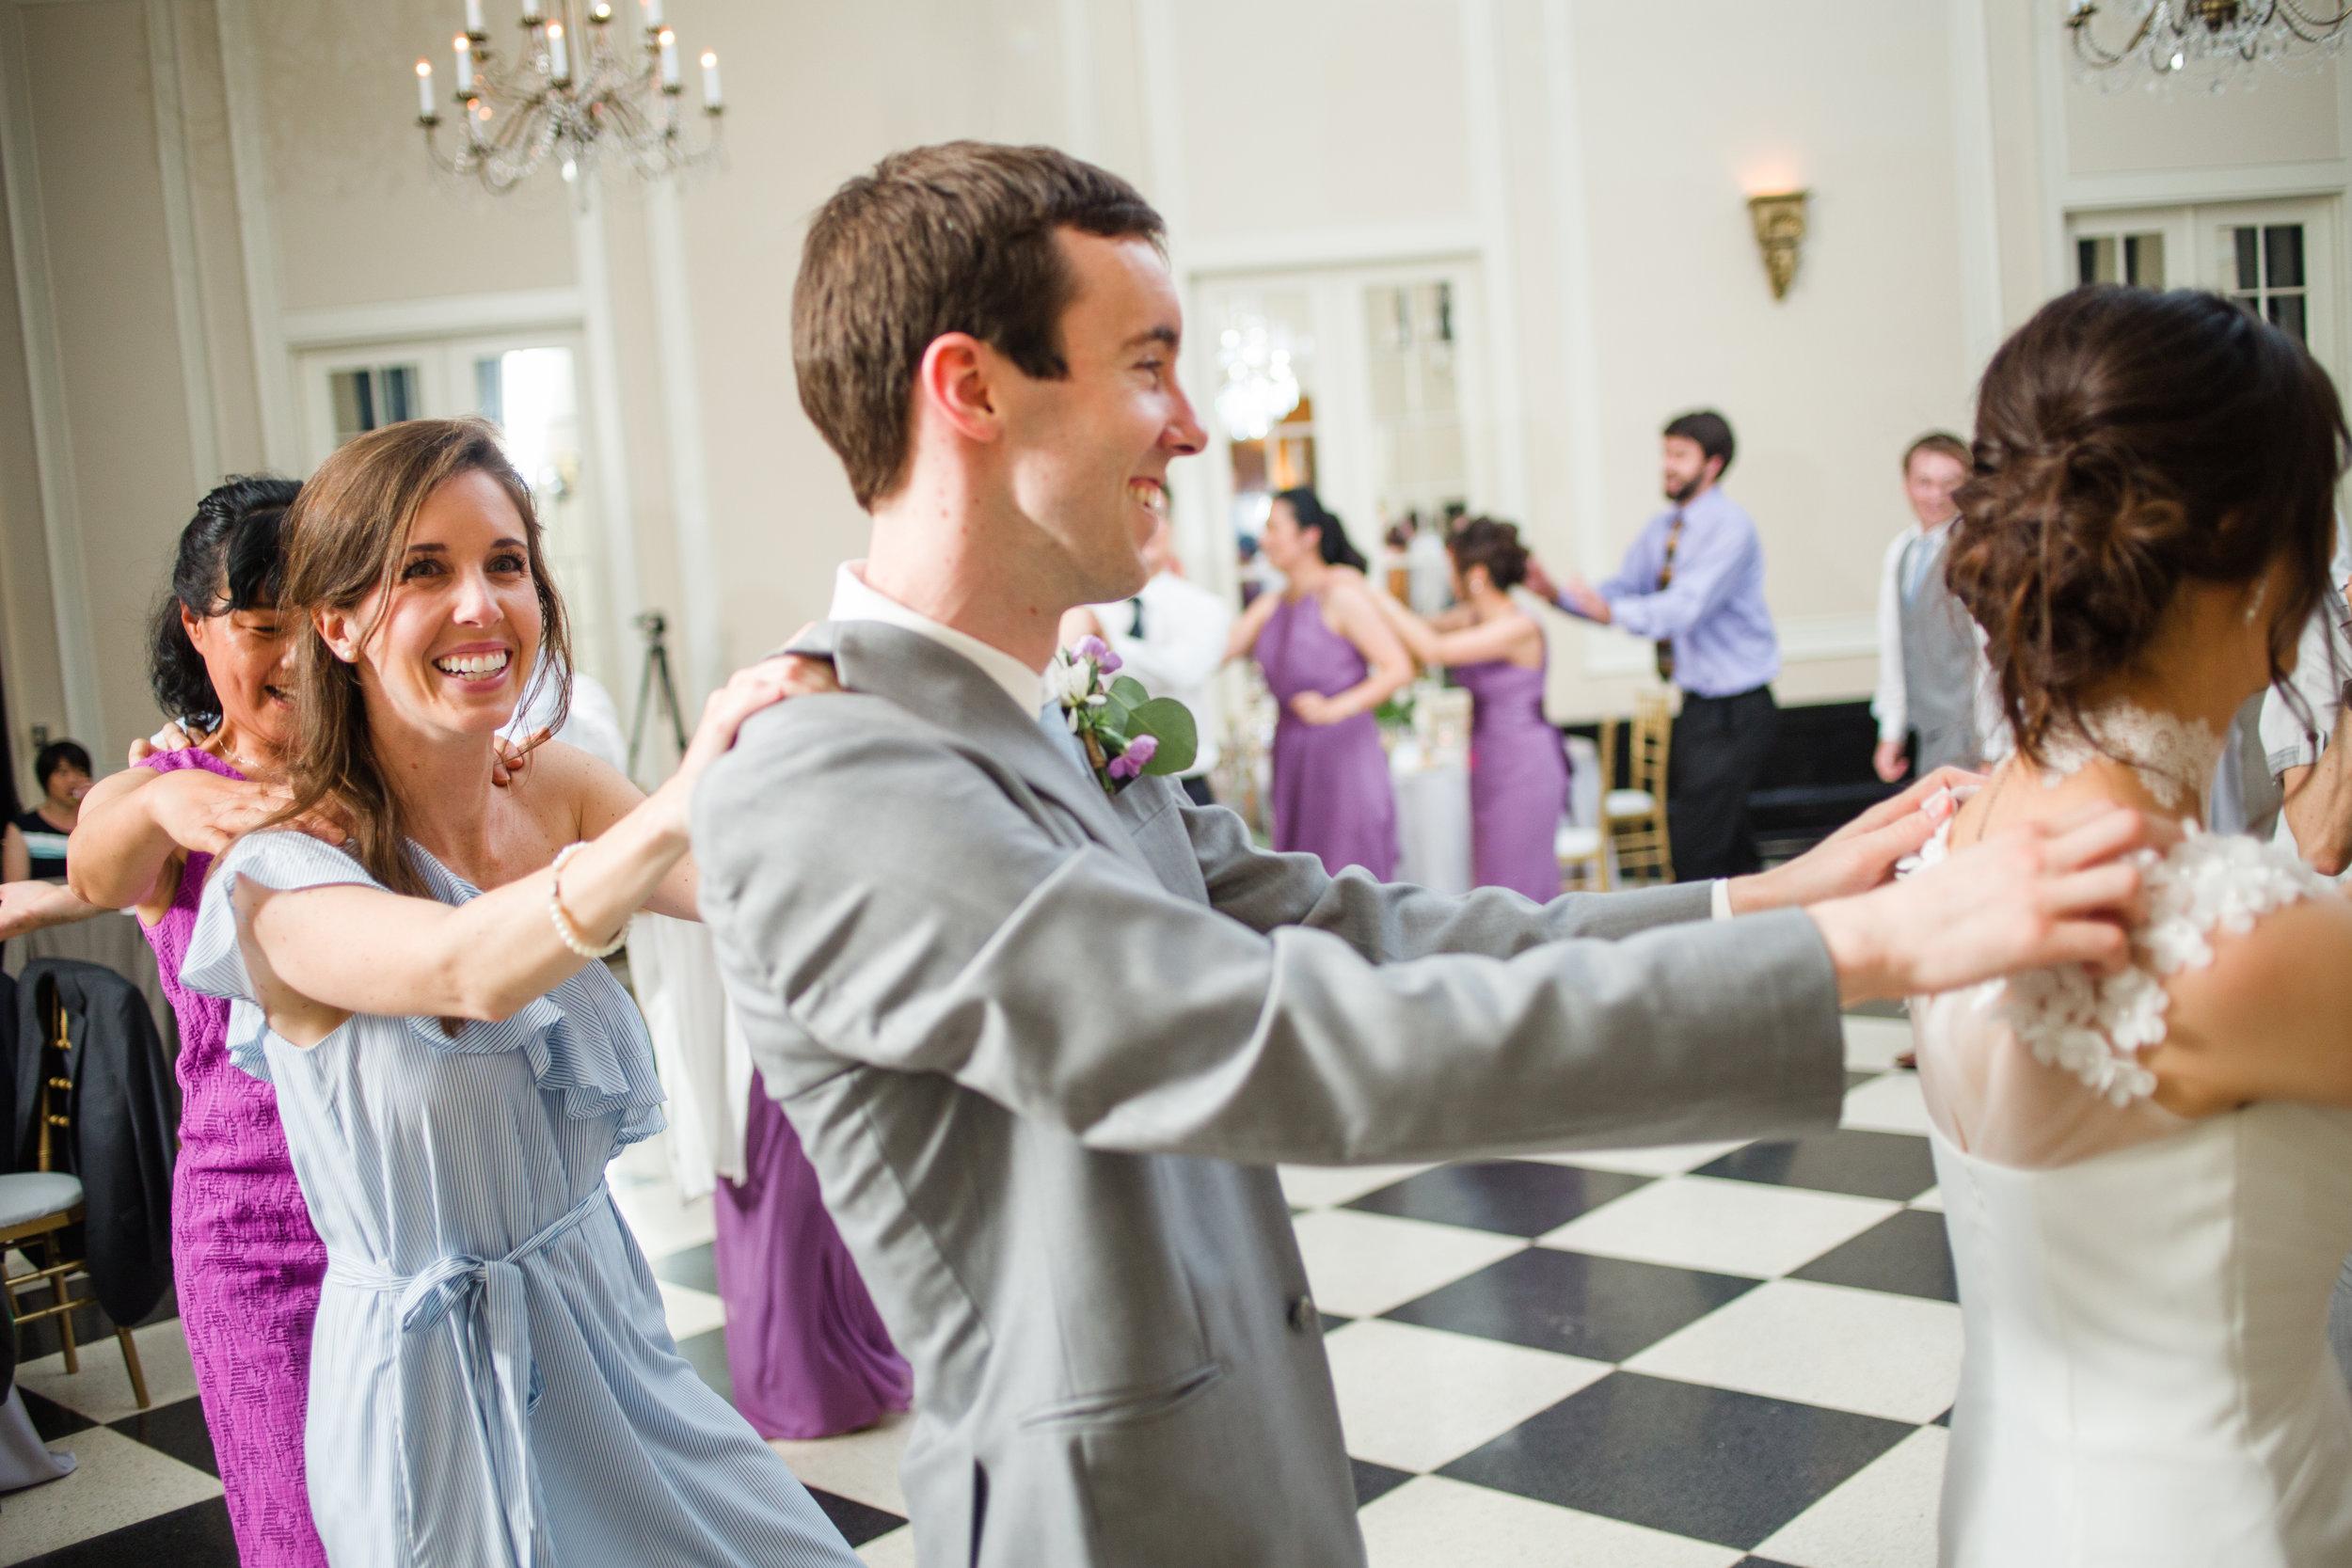 2017_04_30_jenny_jonathans_wedding_reception-327.jpg